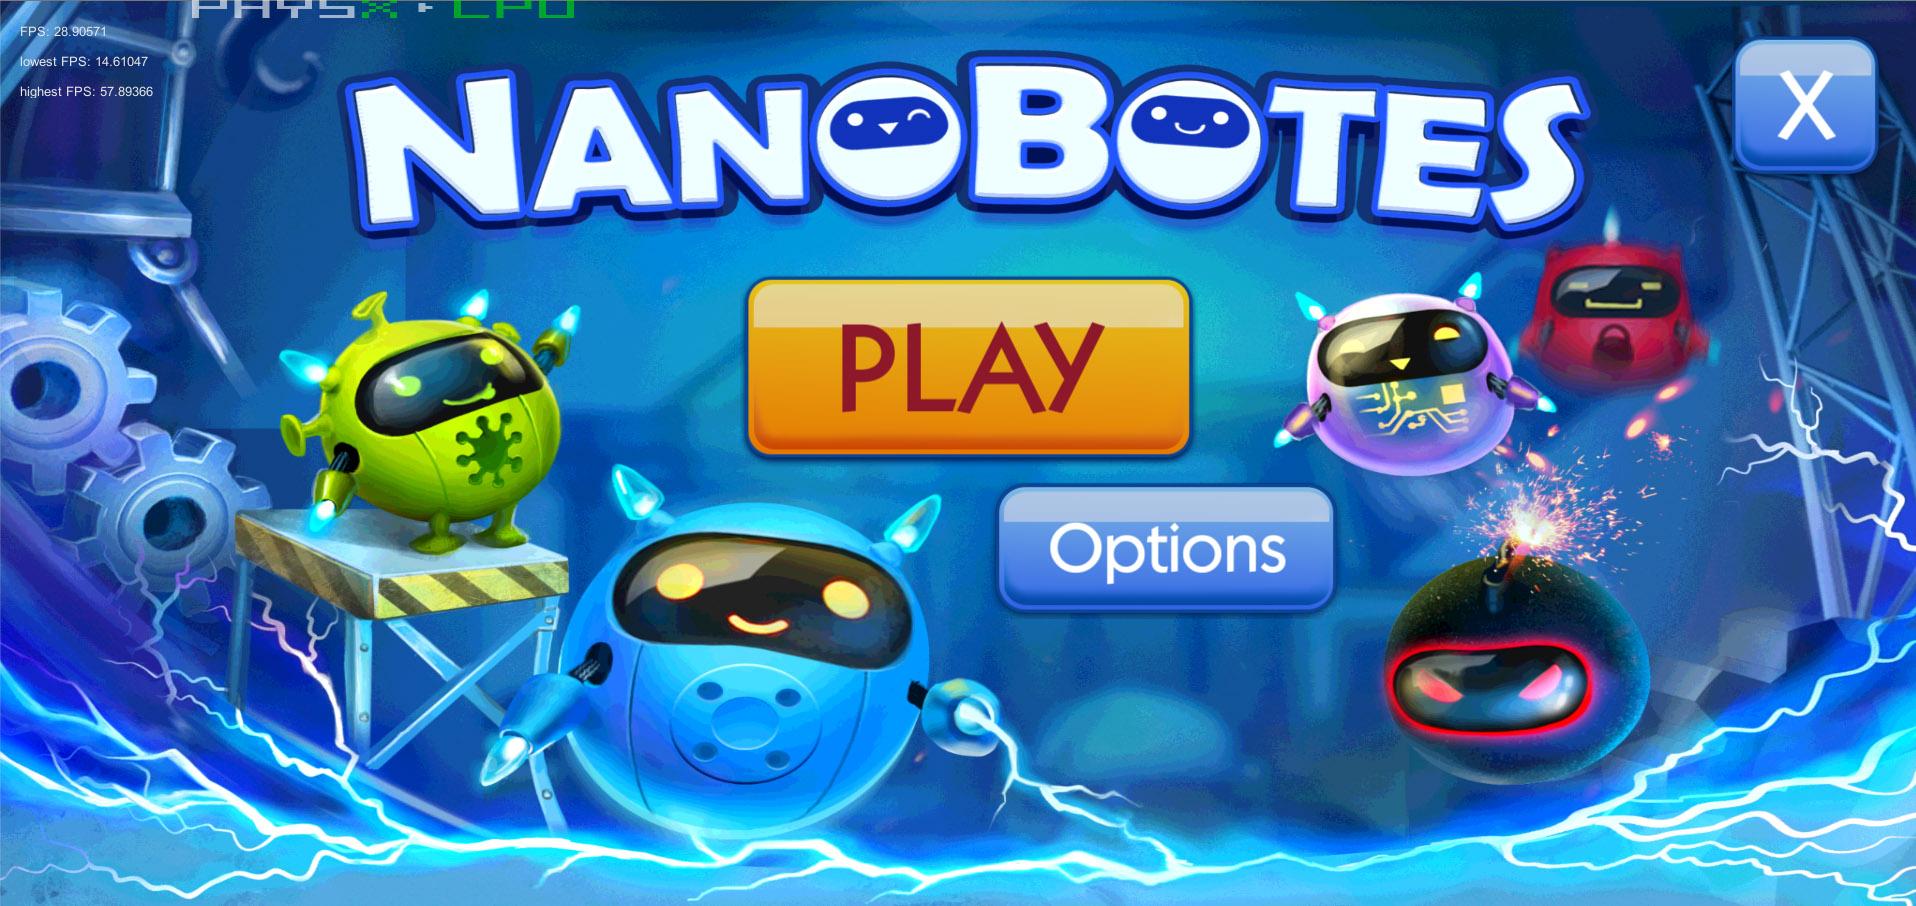 Nanobotes main menu